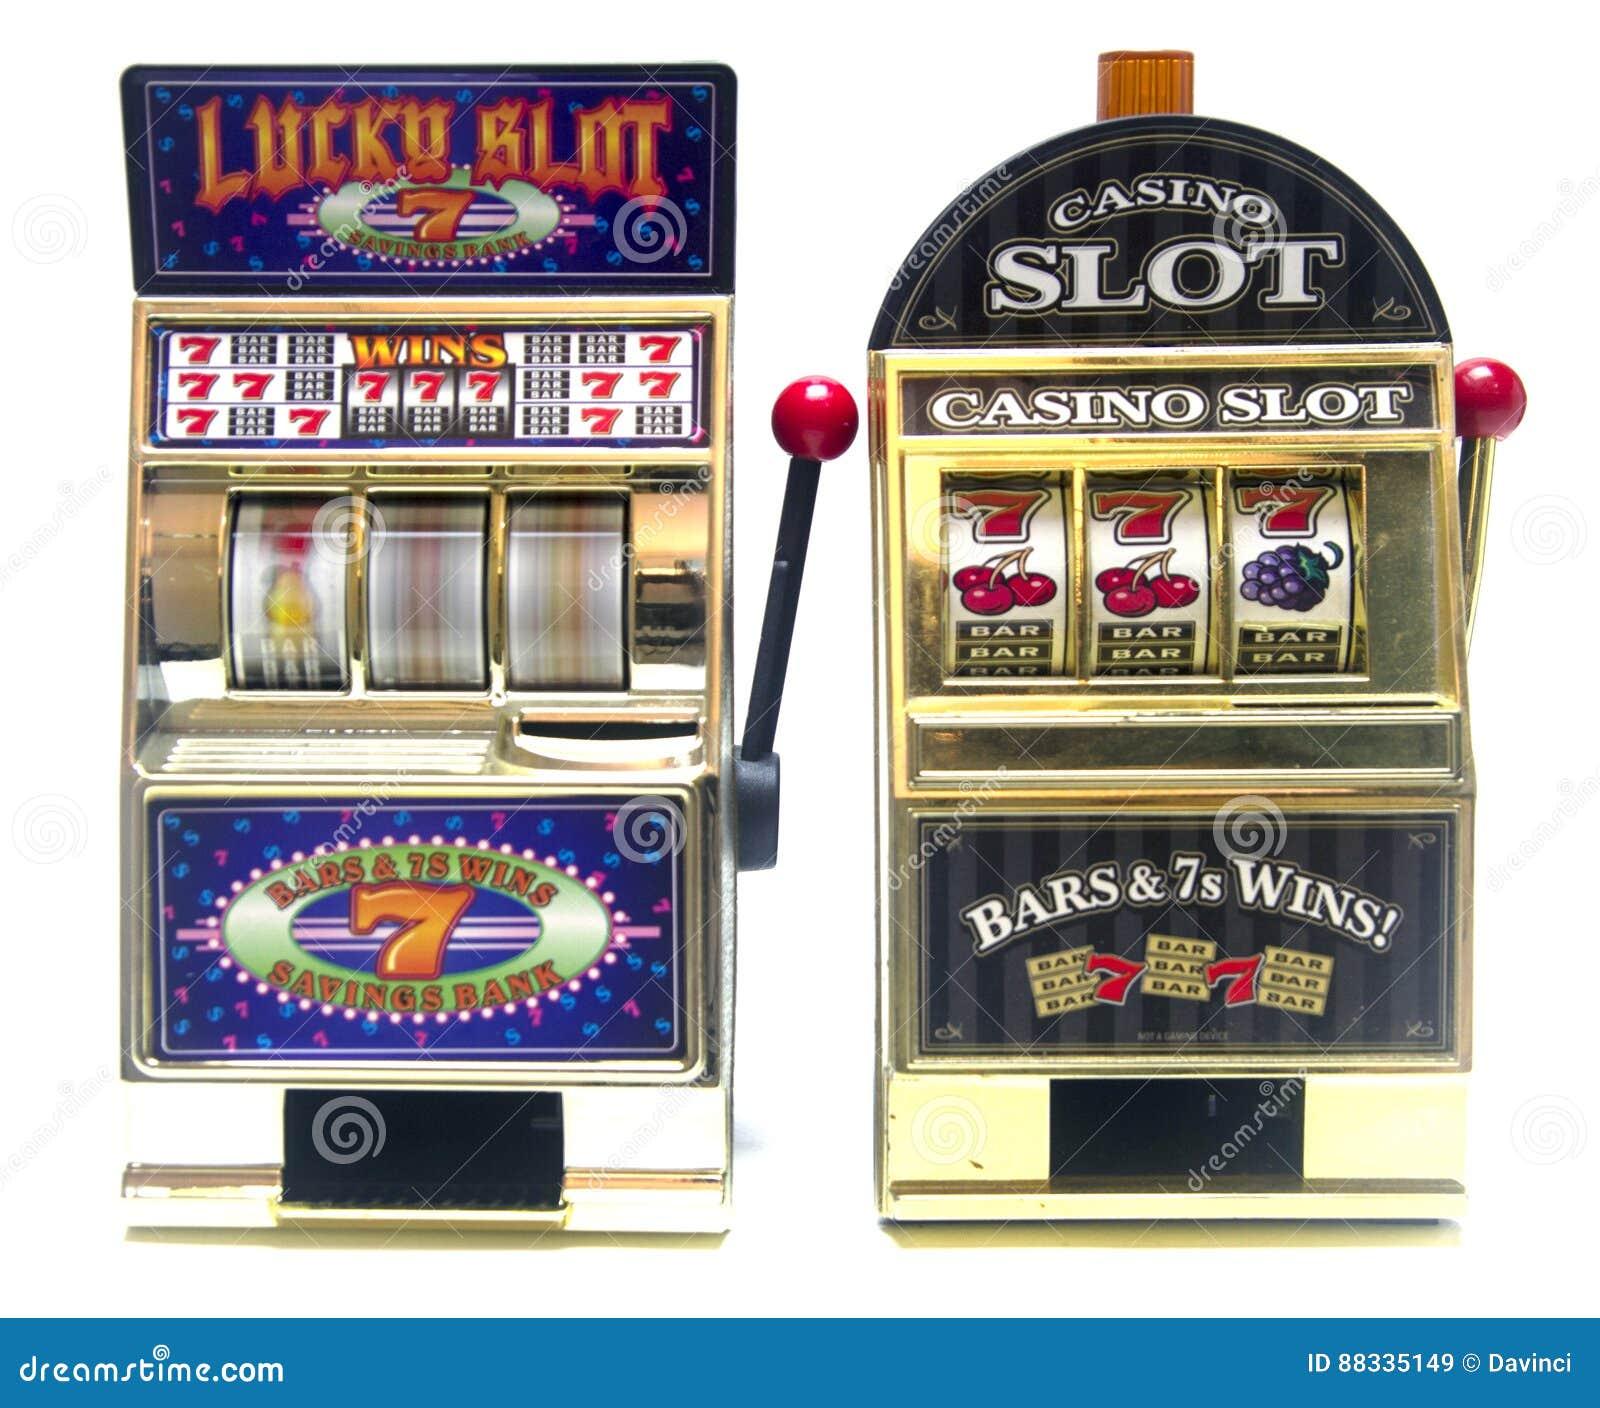 Loki casino no deposit bonus codes